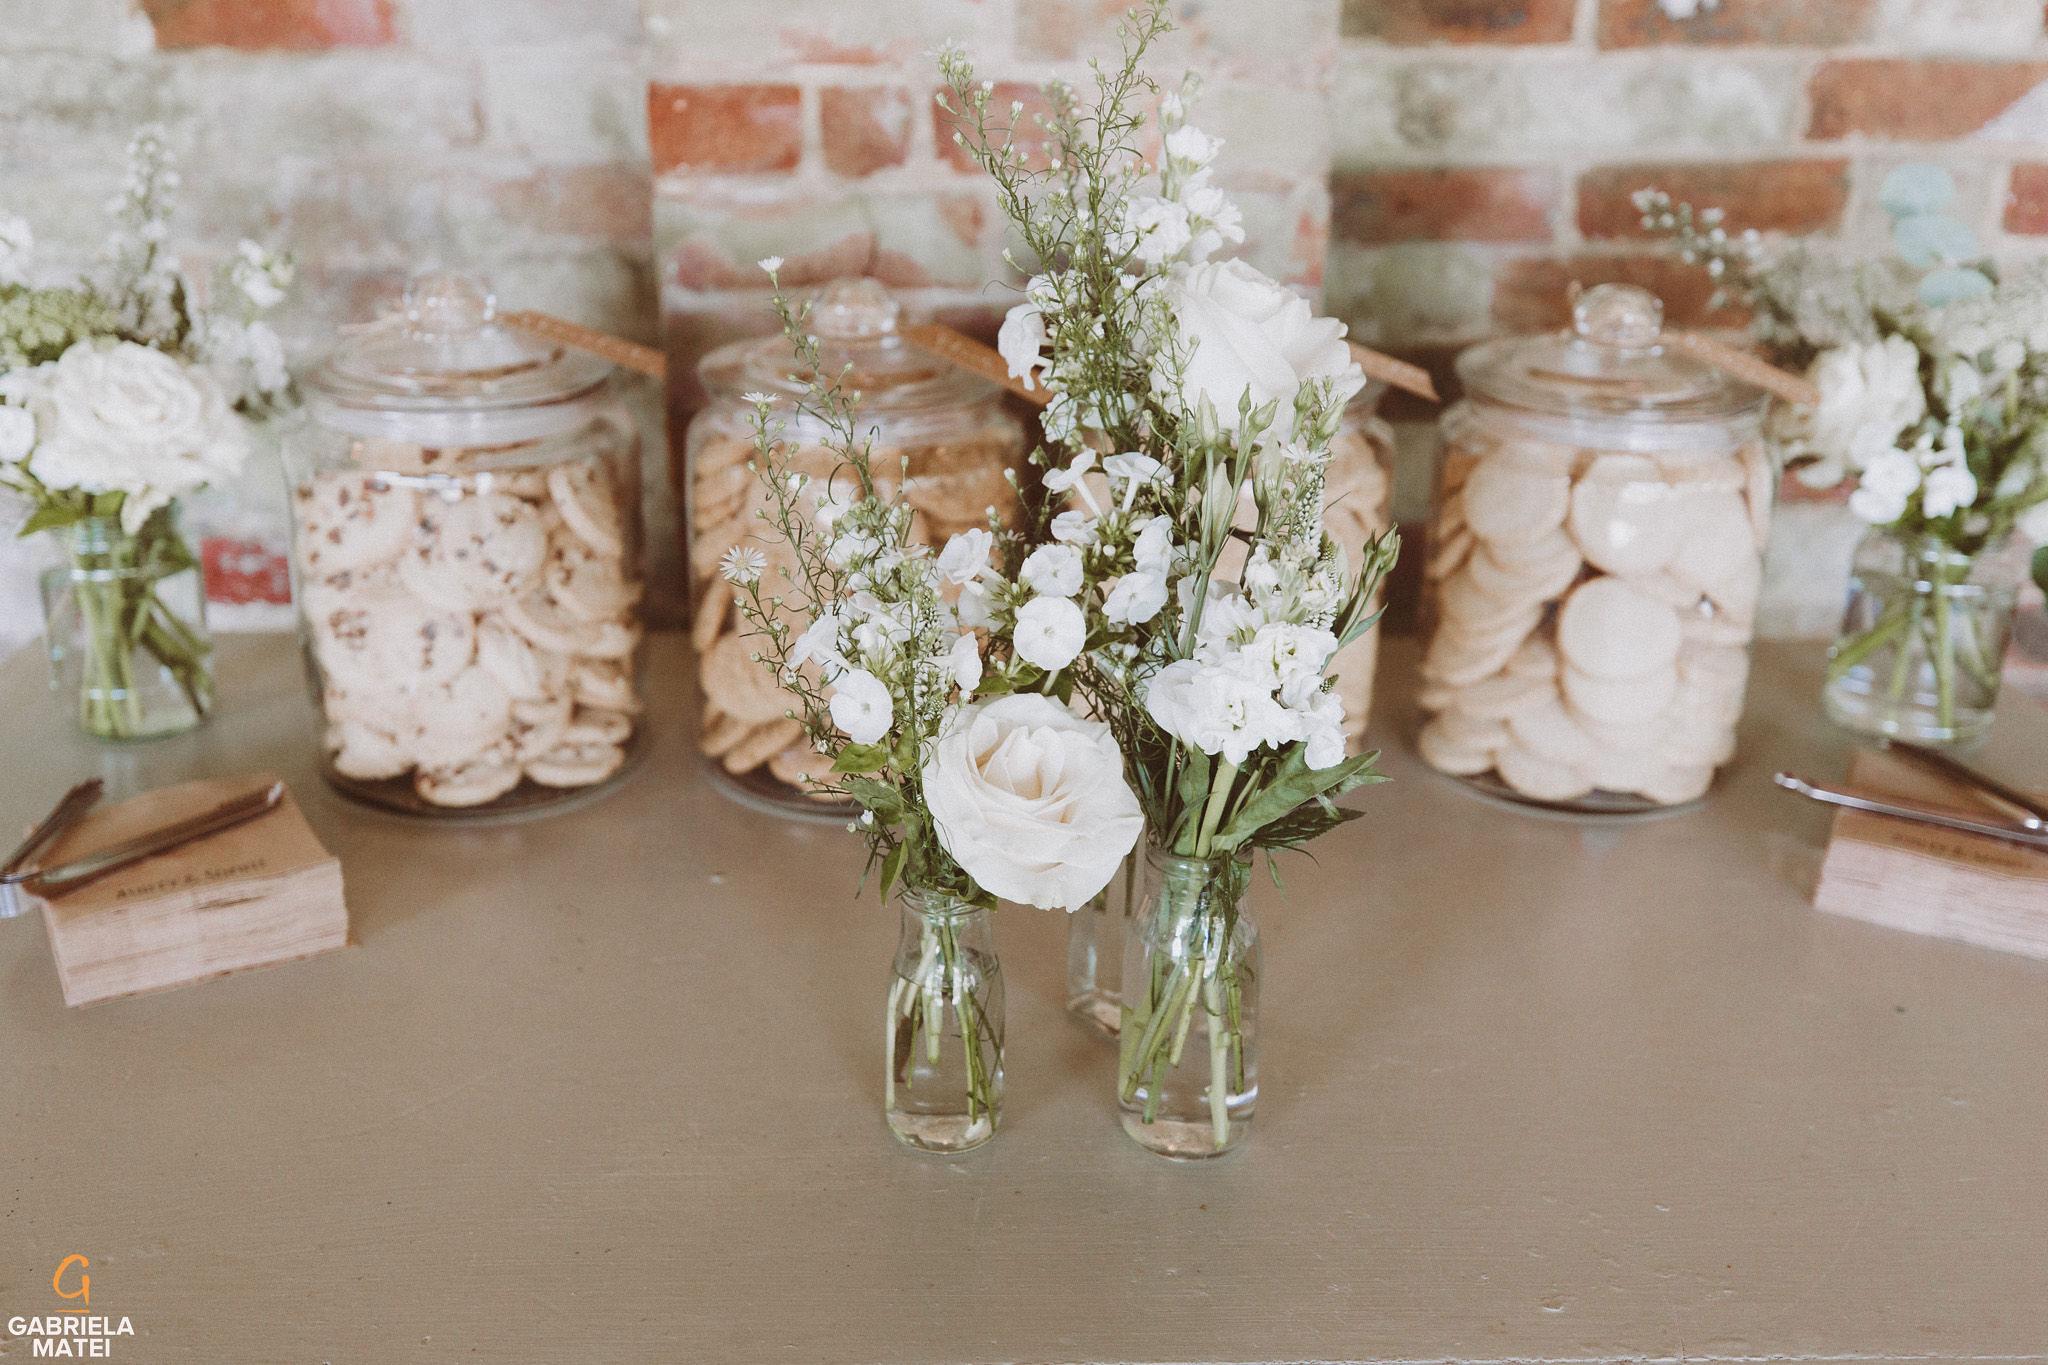 Wedding flowers  at South Stoke Barn wedding venue in Arundel